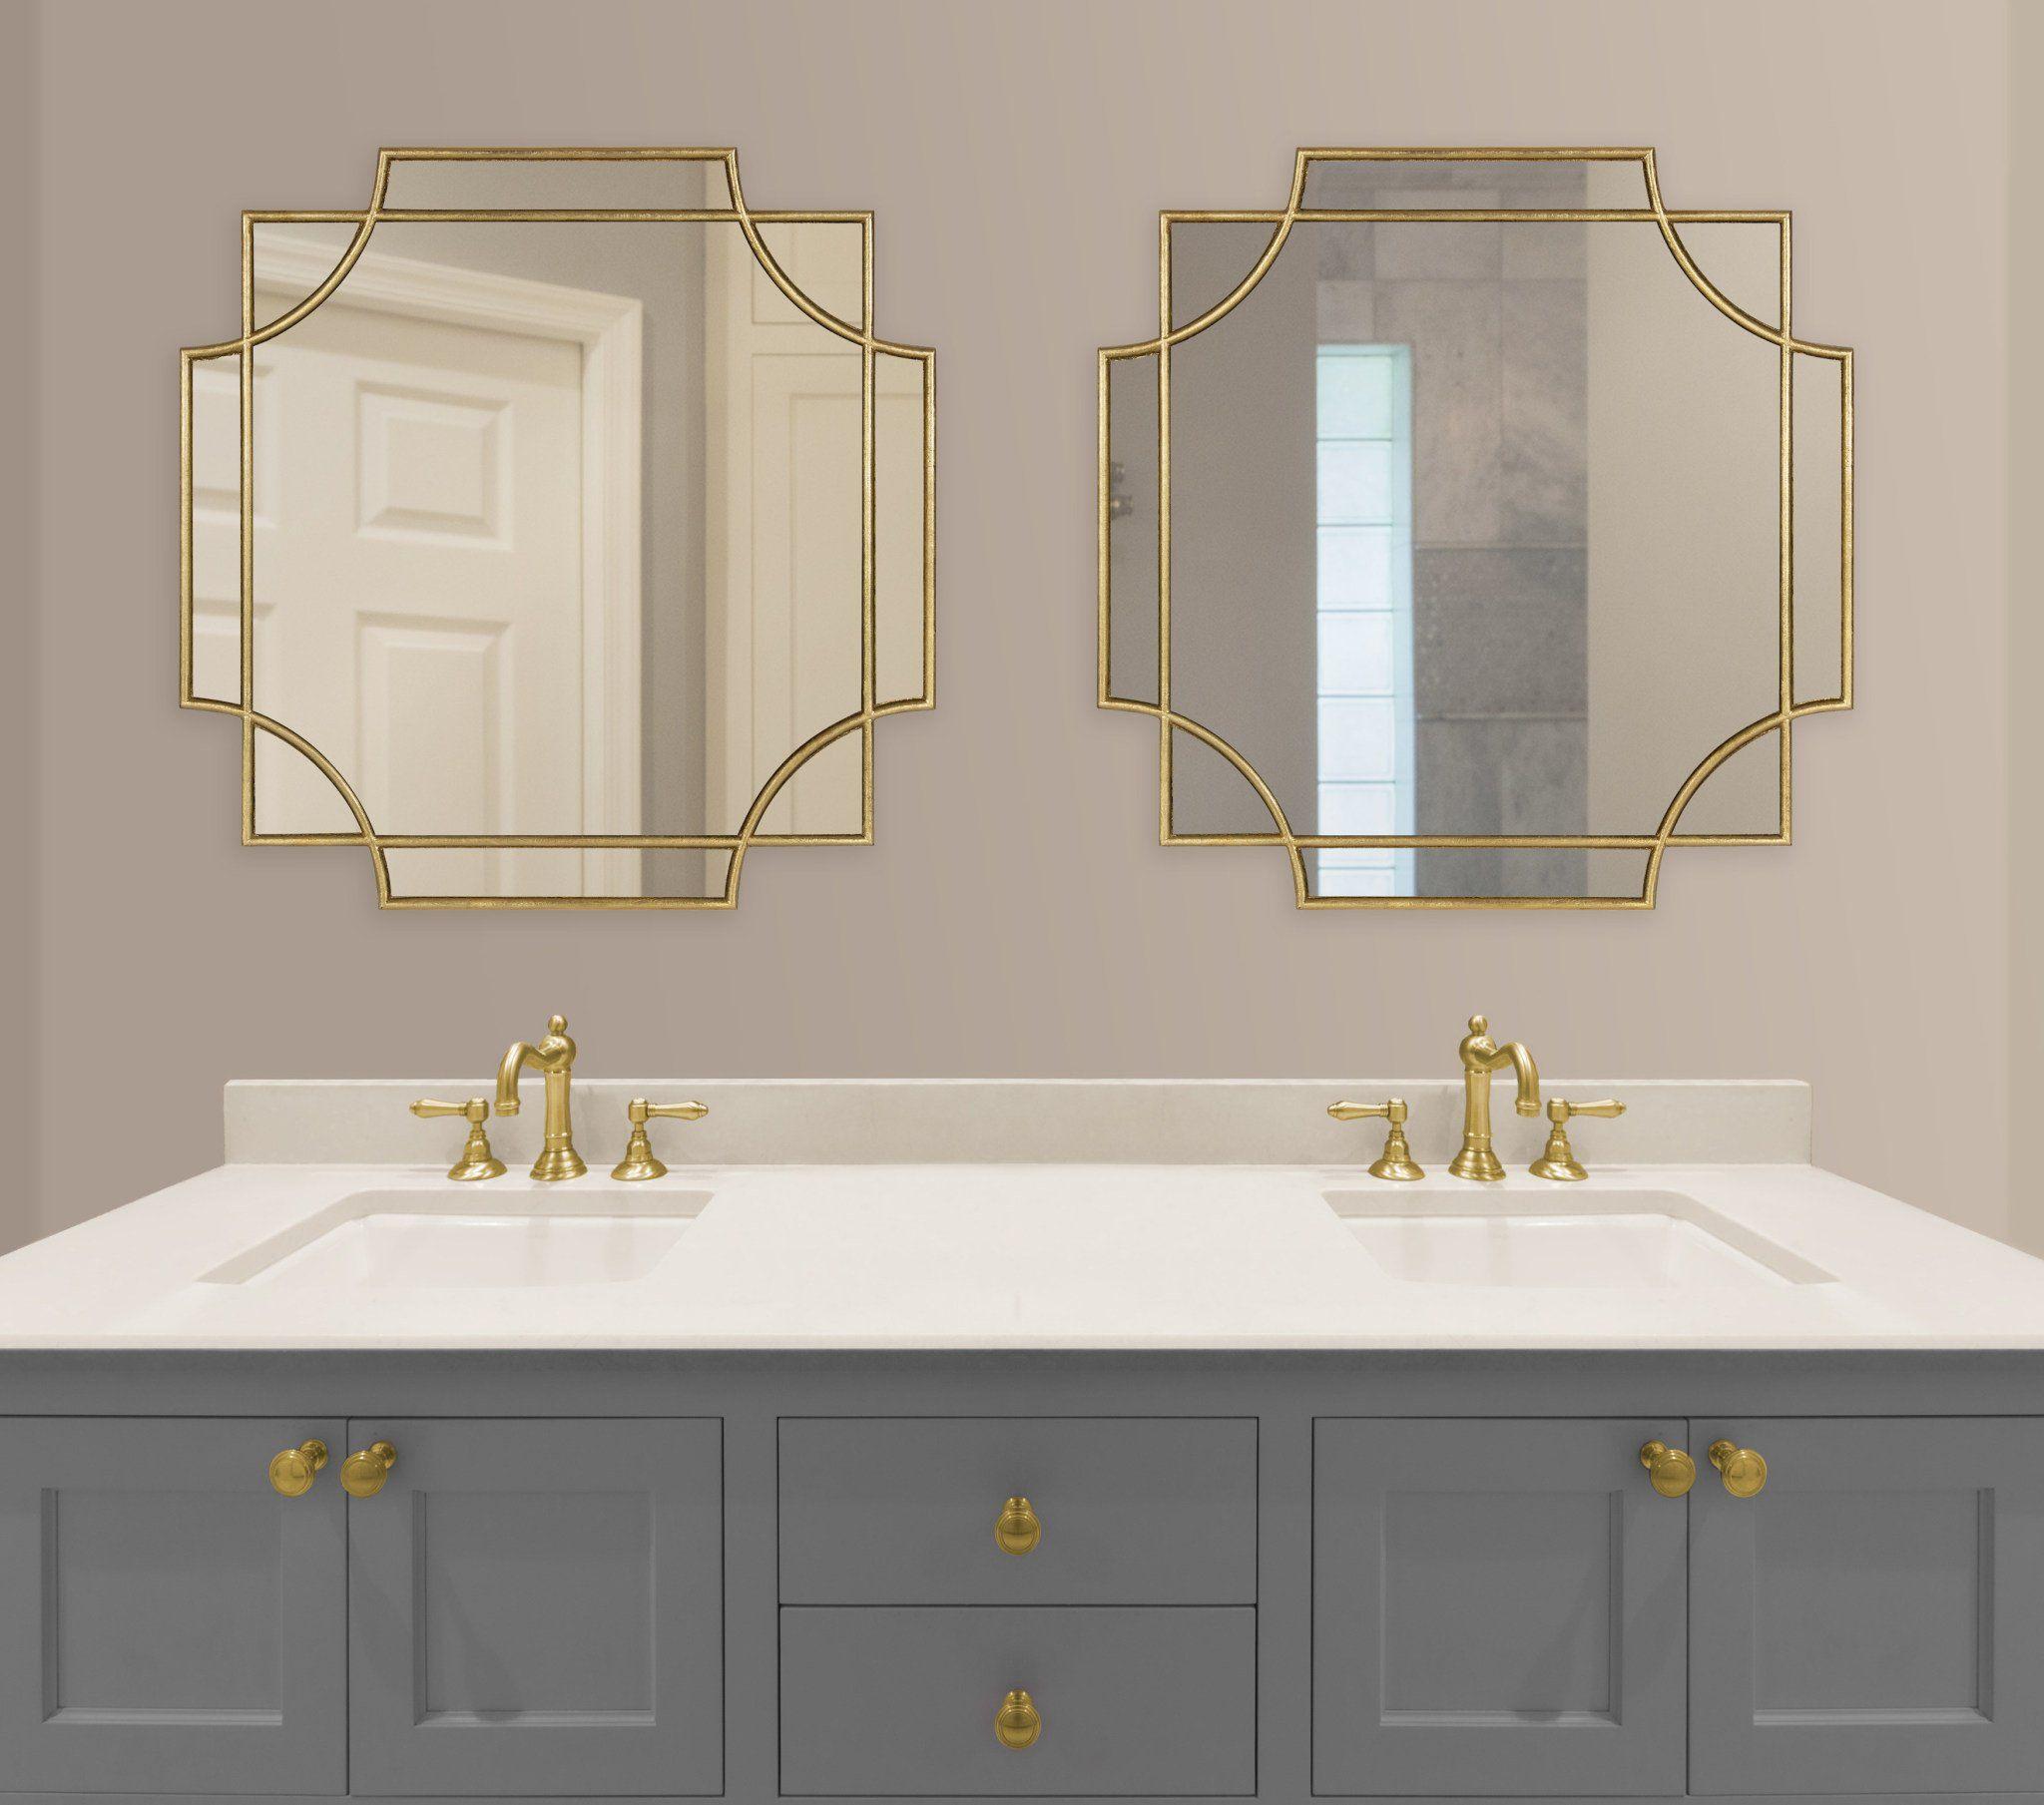 Minuette Decorative Framed Wall Mirror In 2021 Mirror Wall Bathroom Mirror Wall Bathroom Inspiration [ 1809 x 2048 Pixel ]